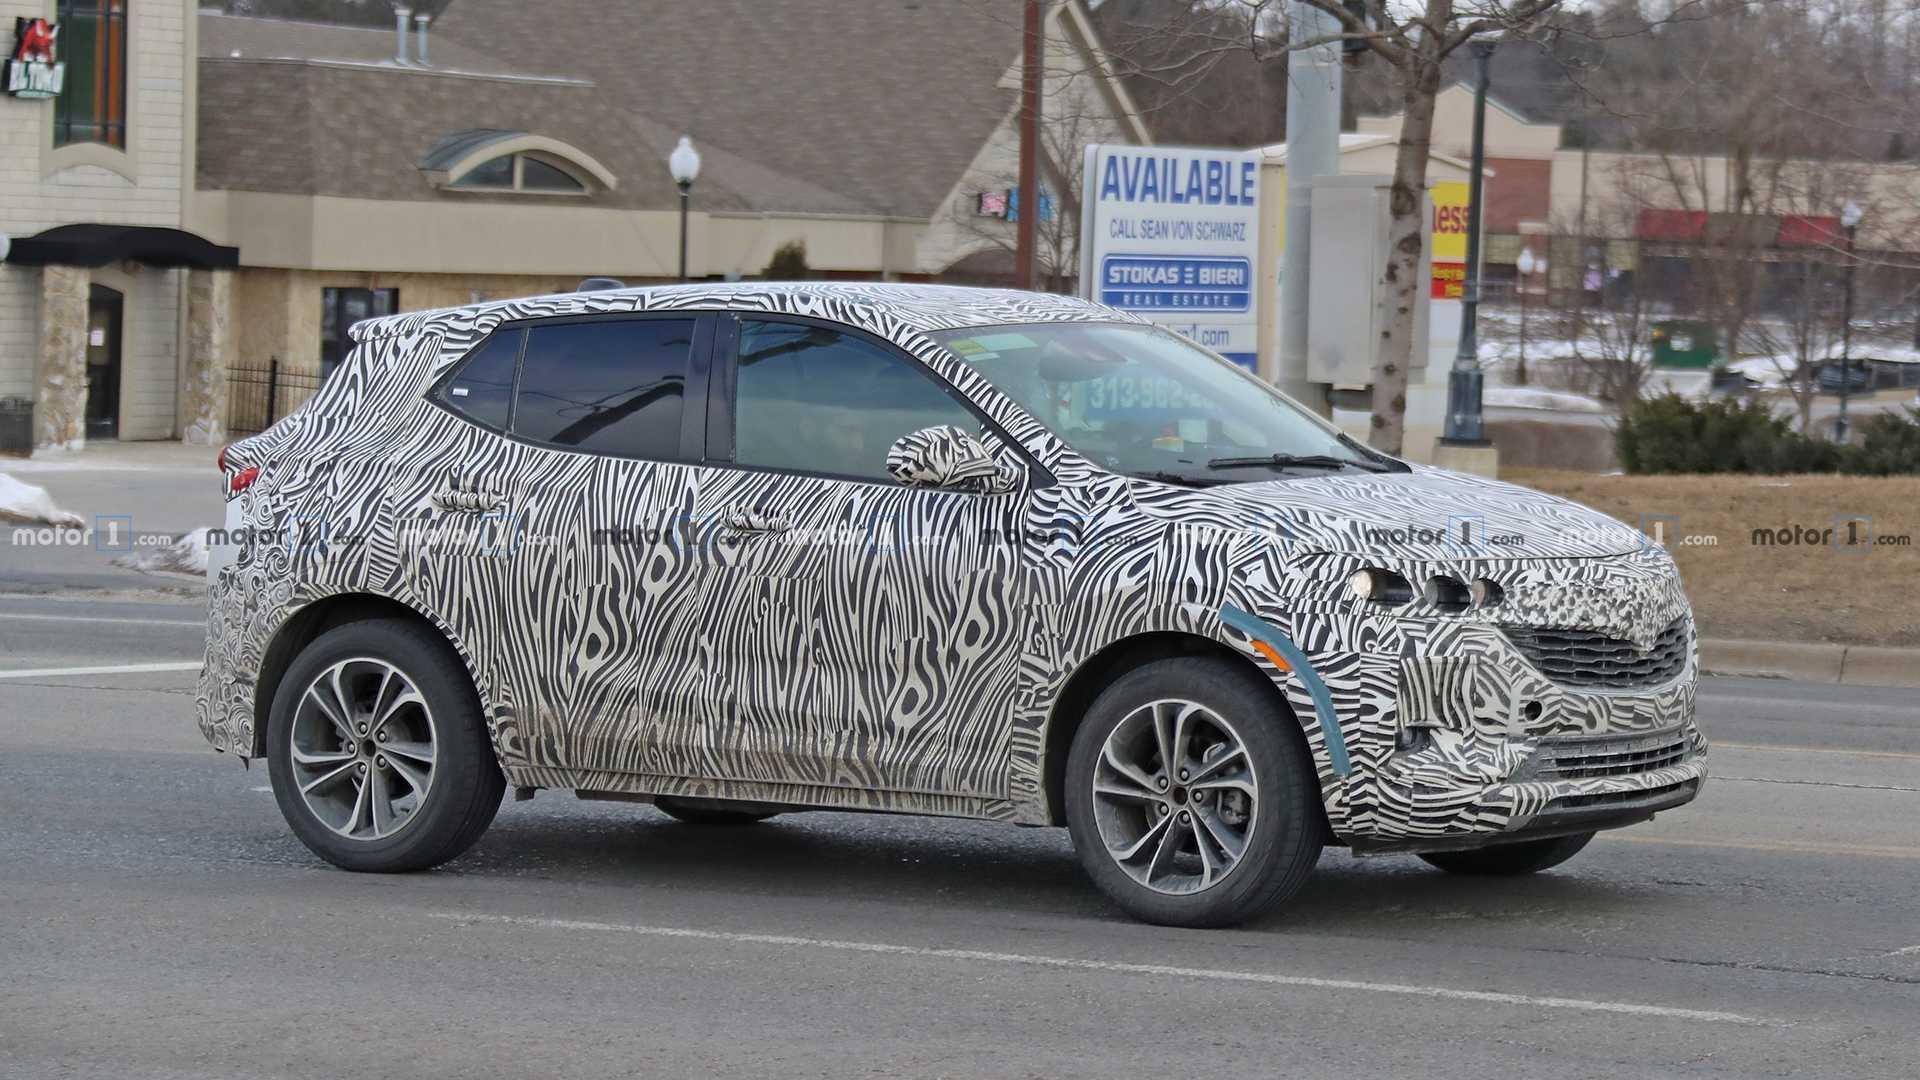 2020 Buick Encore Interior, Spy Photos, Specs >> 2020 Buick Encore Drops Heavy Camo In Latest Spy Photos